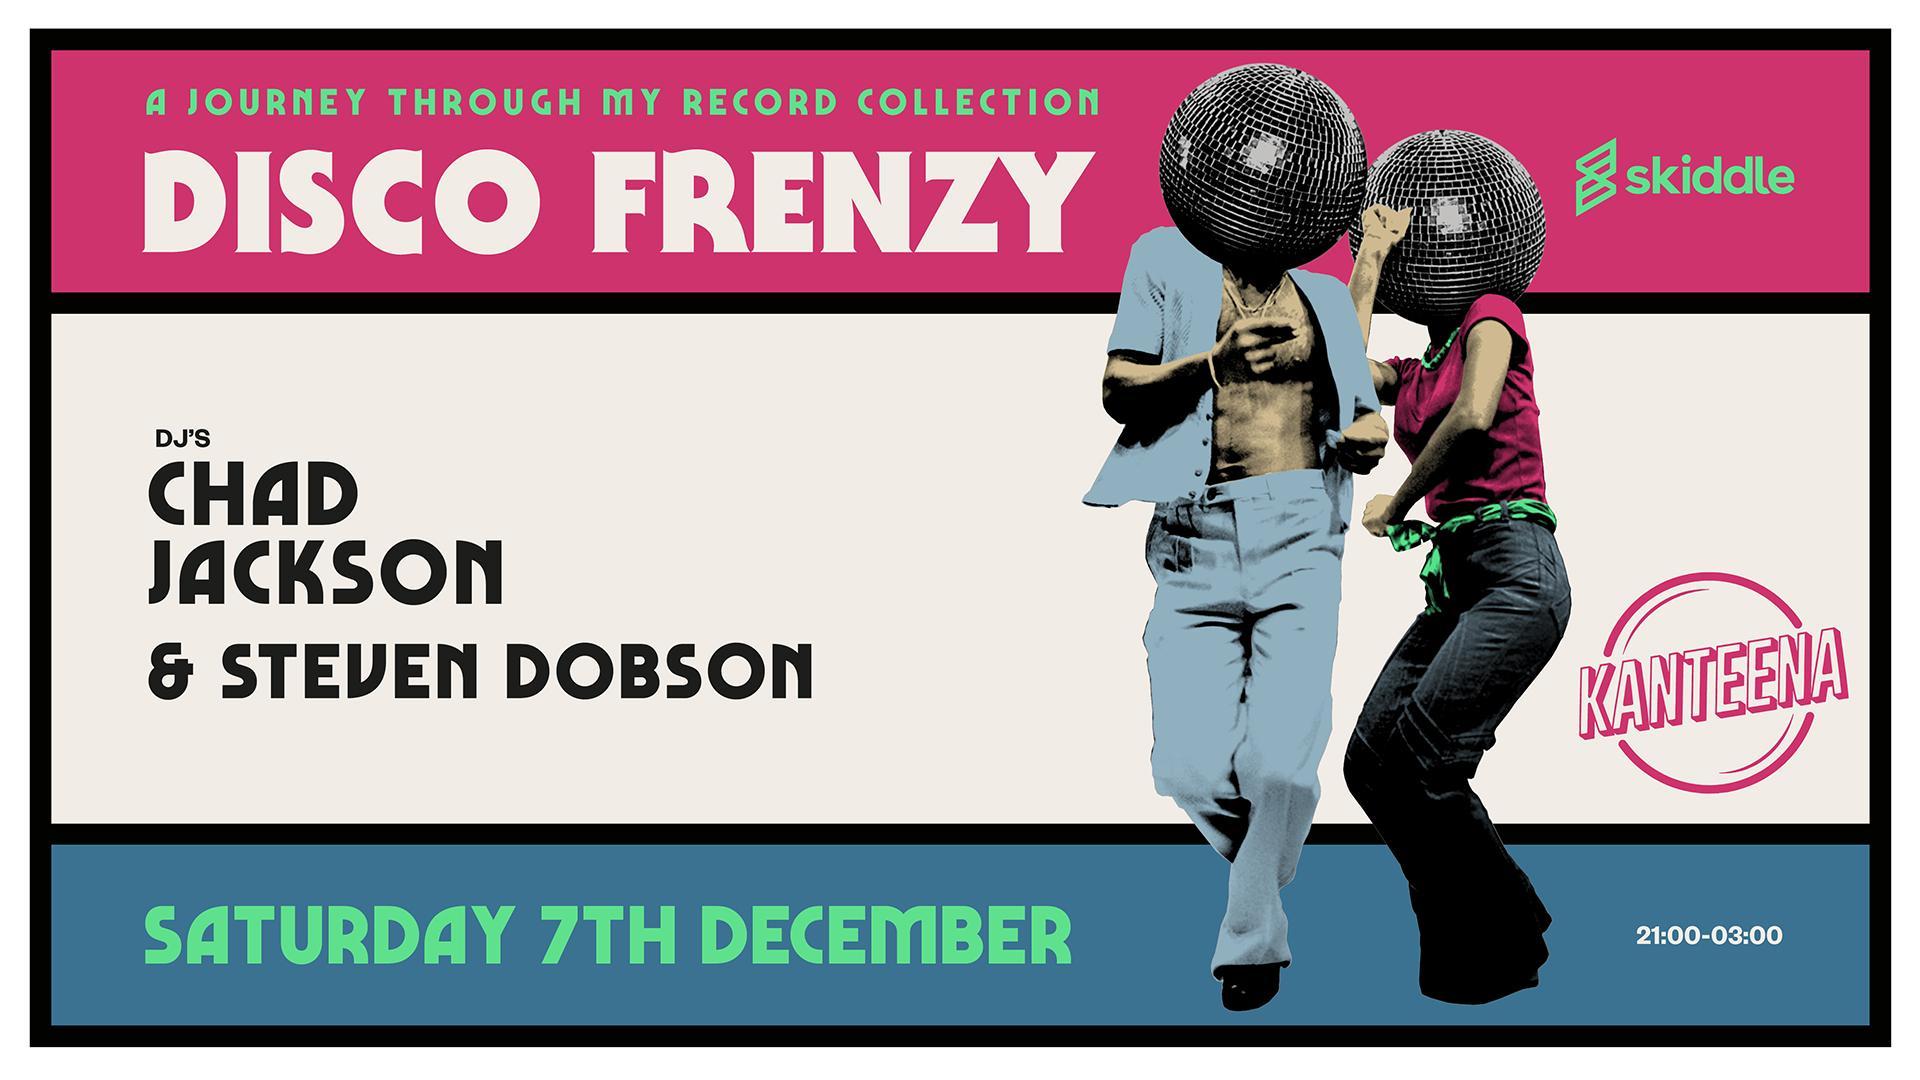 Disco Frenzy